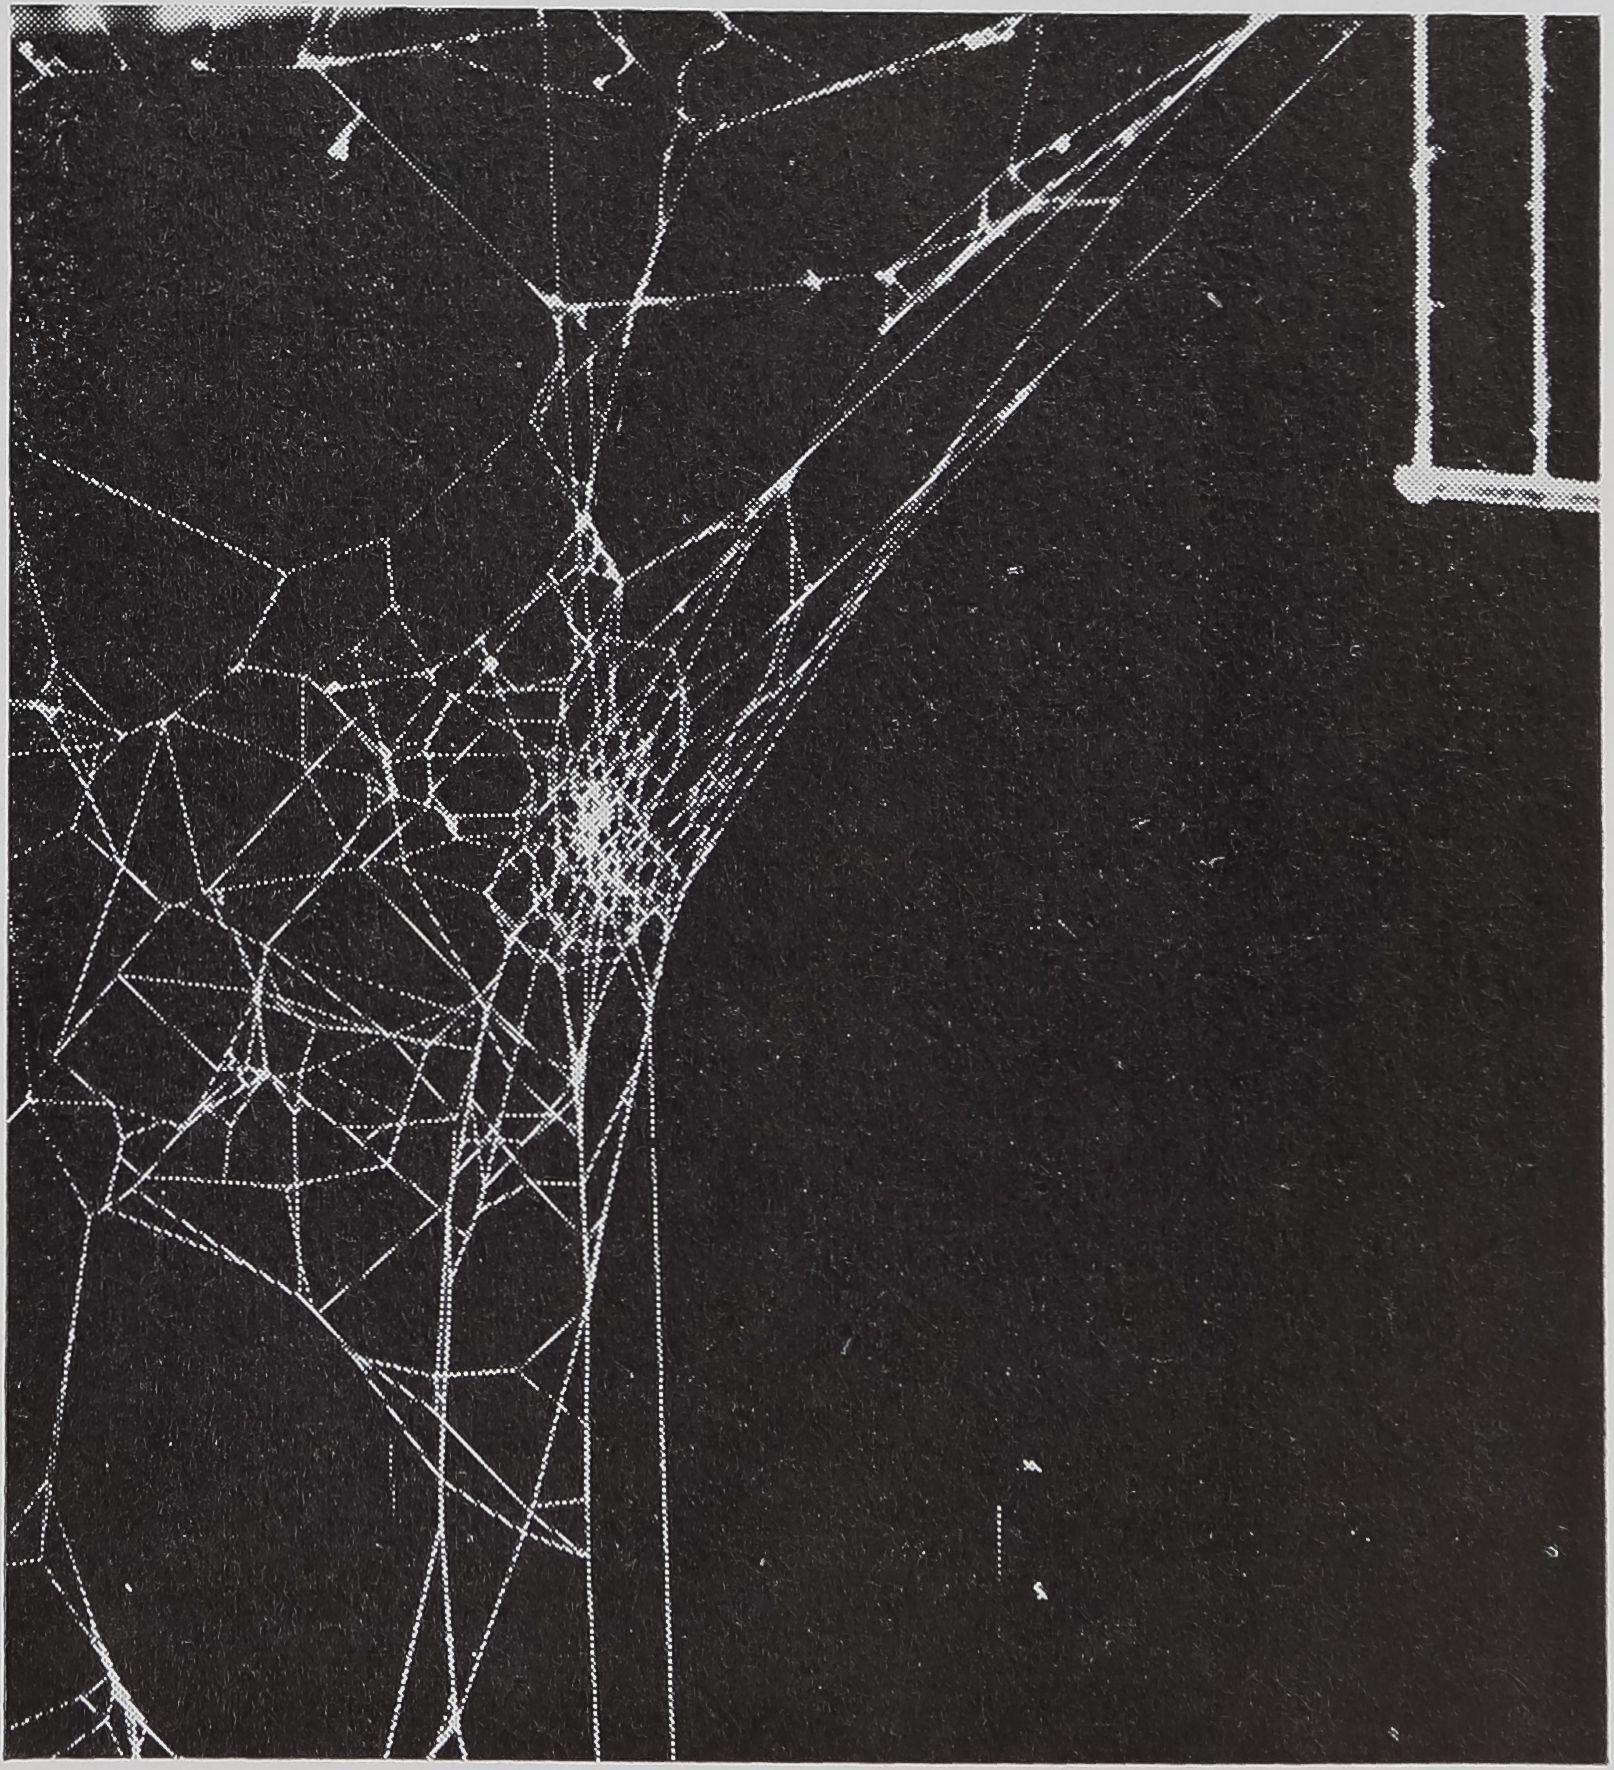 1971-BehavioralScienceTheBiology-3